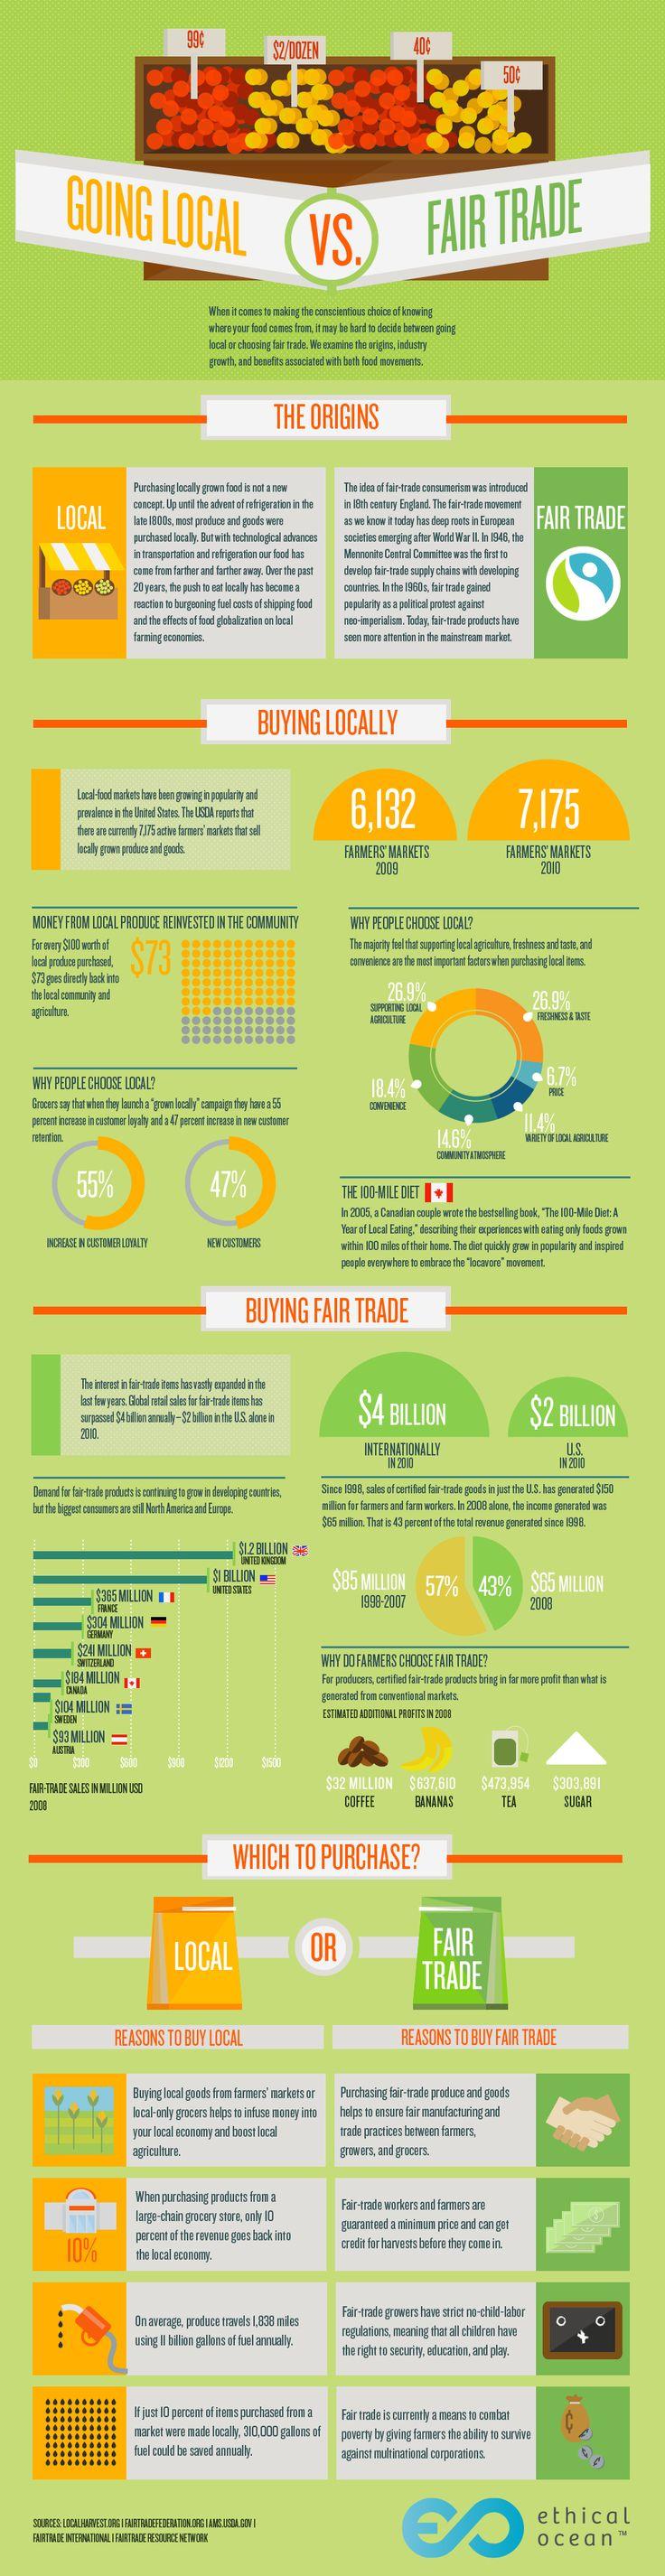 Buying local vs. Fair trade